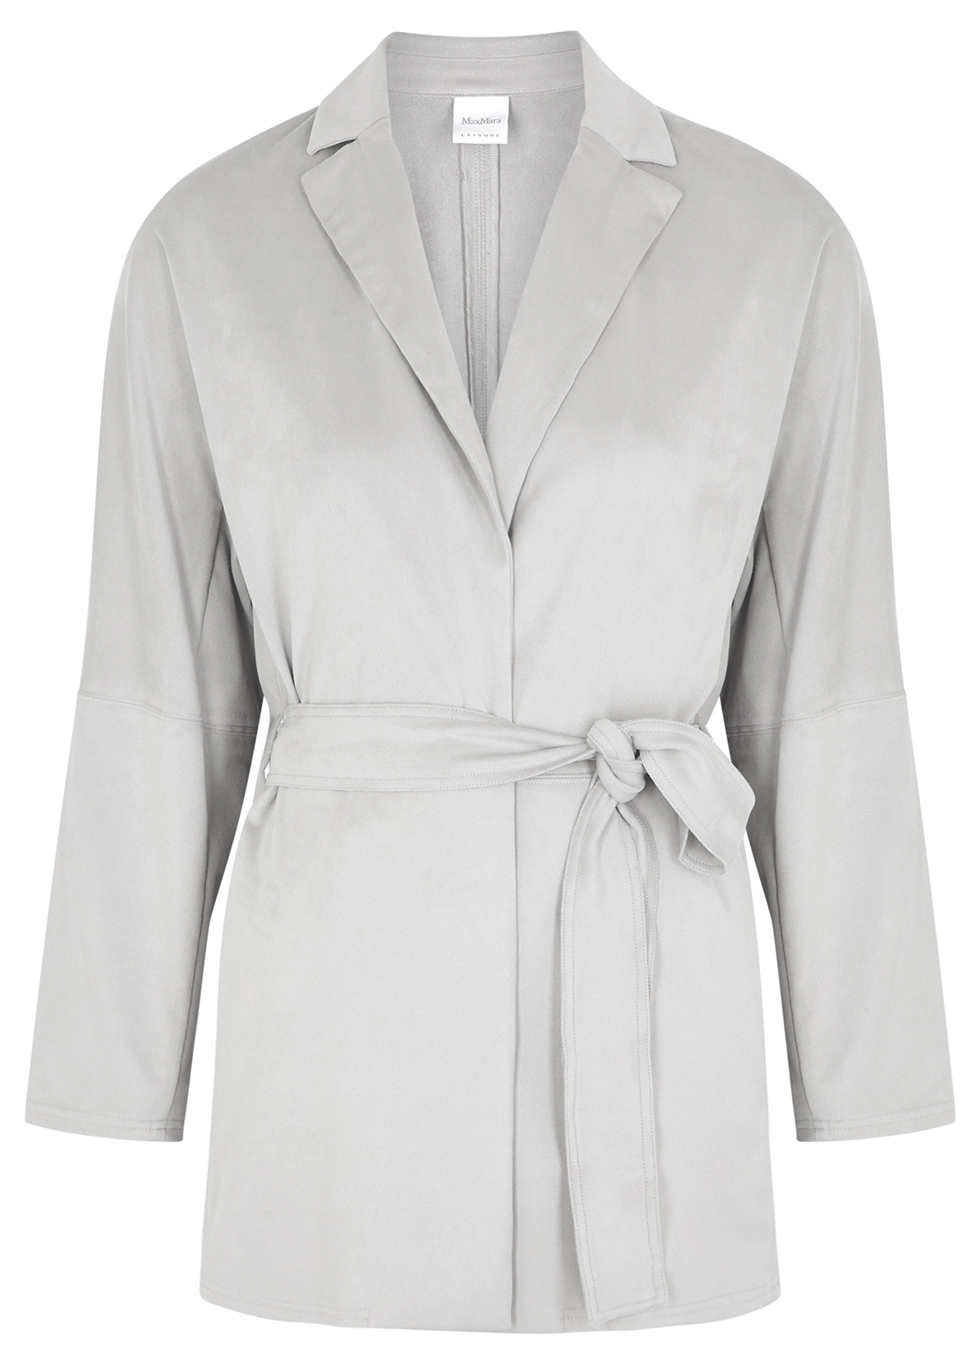 Beato light grey faux suede jacket